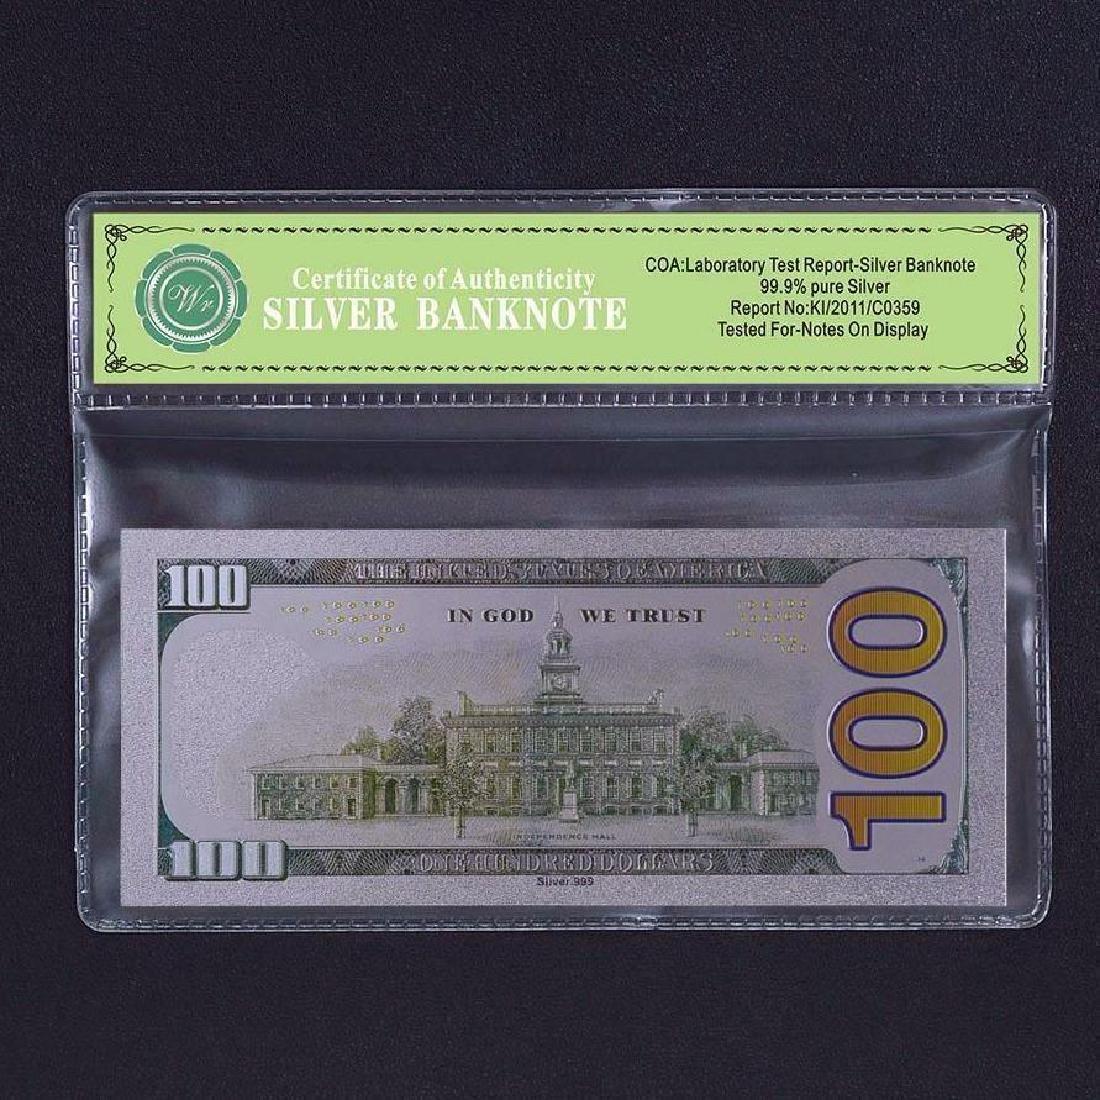 USA $100 24K Silver Clad Banknote - 2